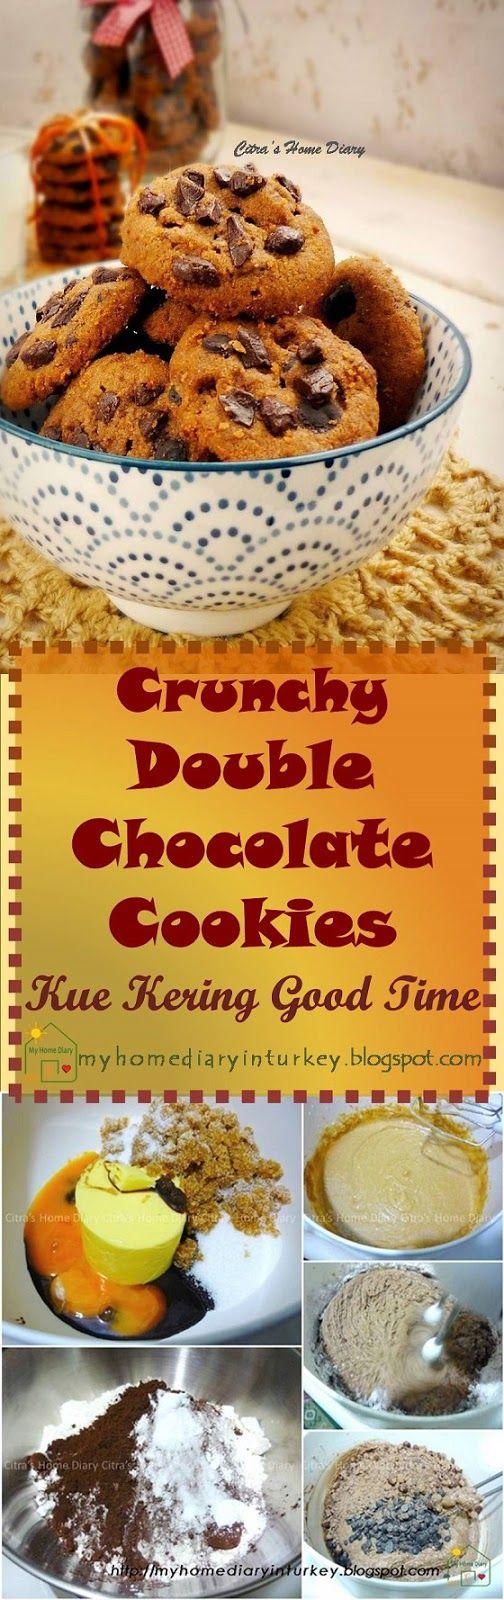 Resep Good Time : resep, Resep, Kering, Crunchy, Double, Chocolate, Cookies, Copycat, Recipe., #goodtim…, Favorite, Dessert, Recipes,, Cookies,, Homemade, Recipes